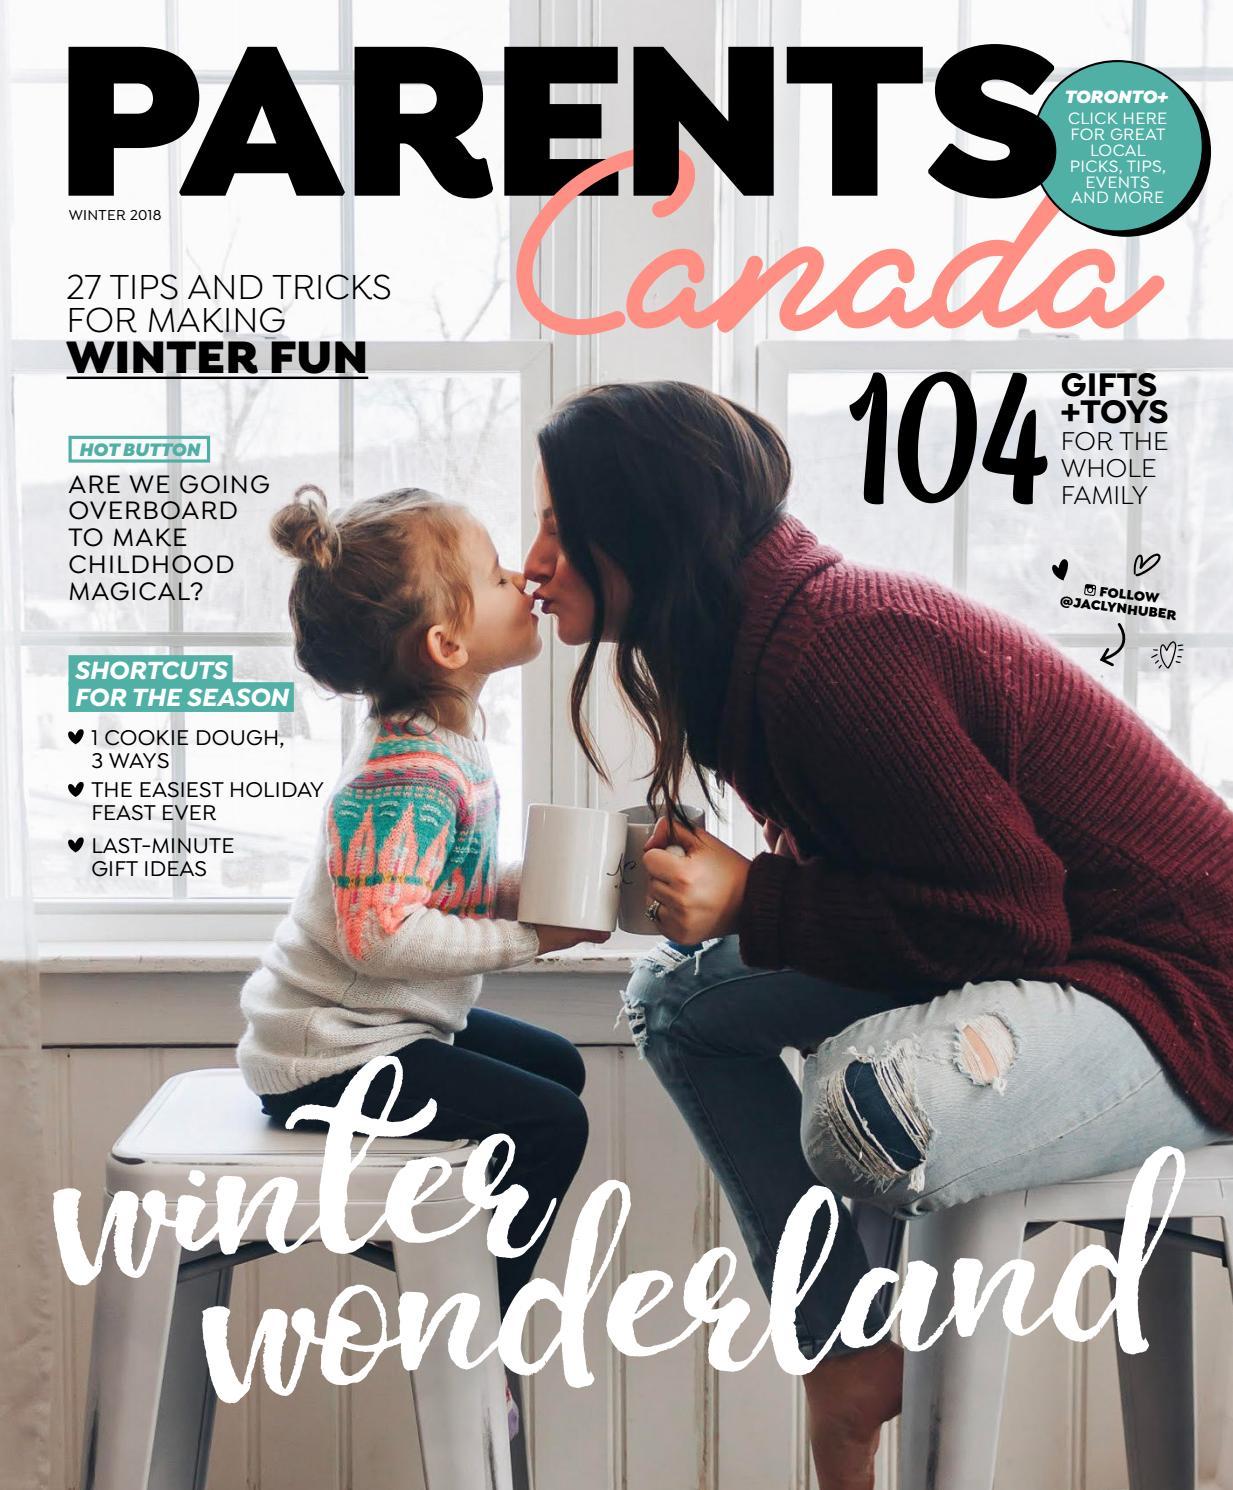 f5af1c9b57 Parents Canada - Winter Wonderland by ParentsCanada - issuu